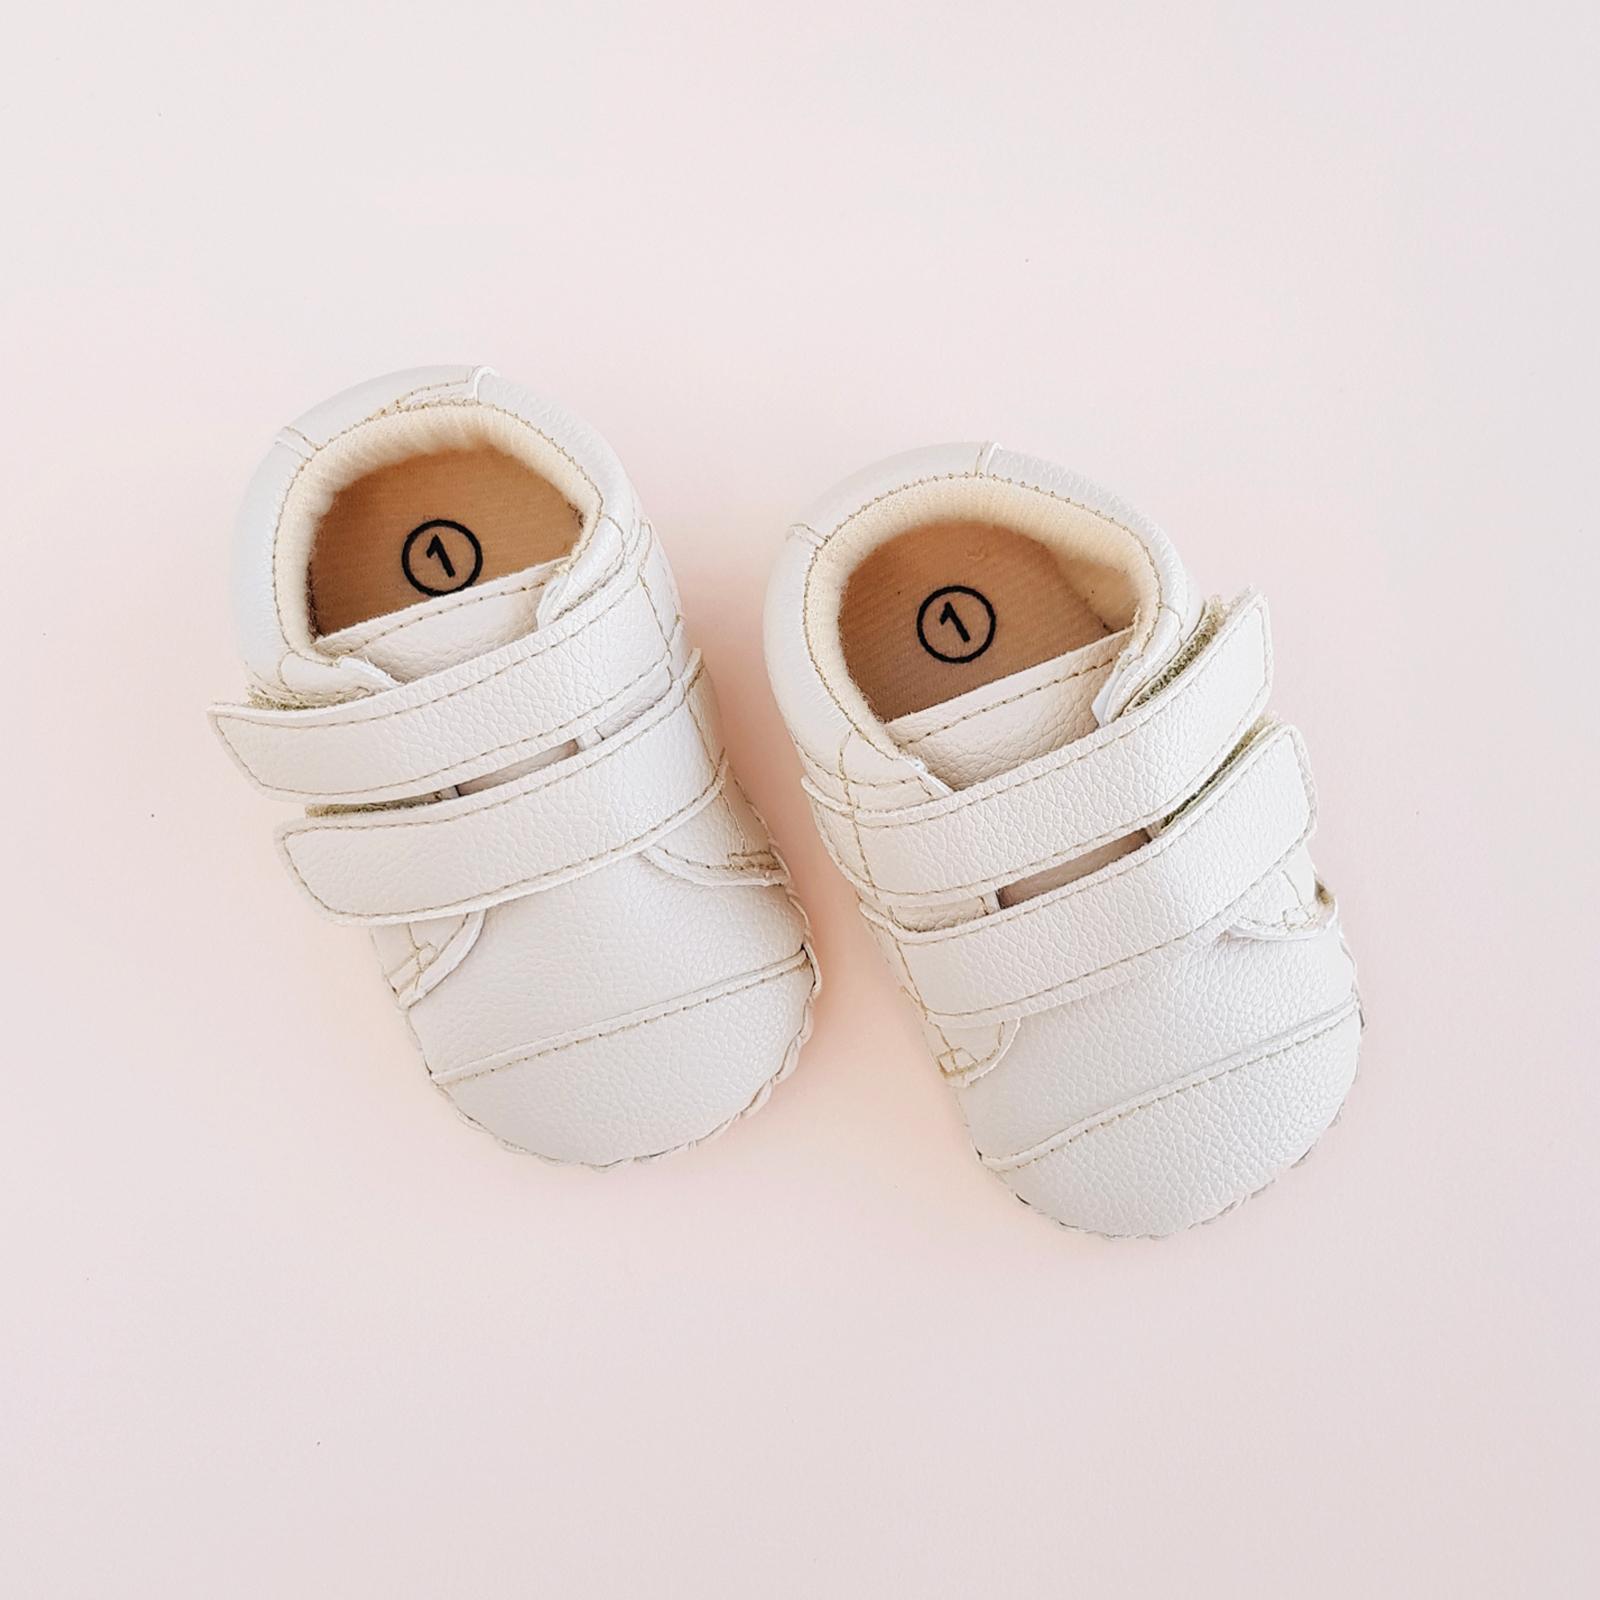 Velcro Shoes1600x1600-1.jpg